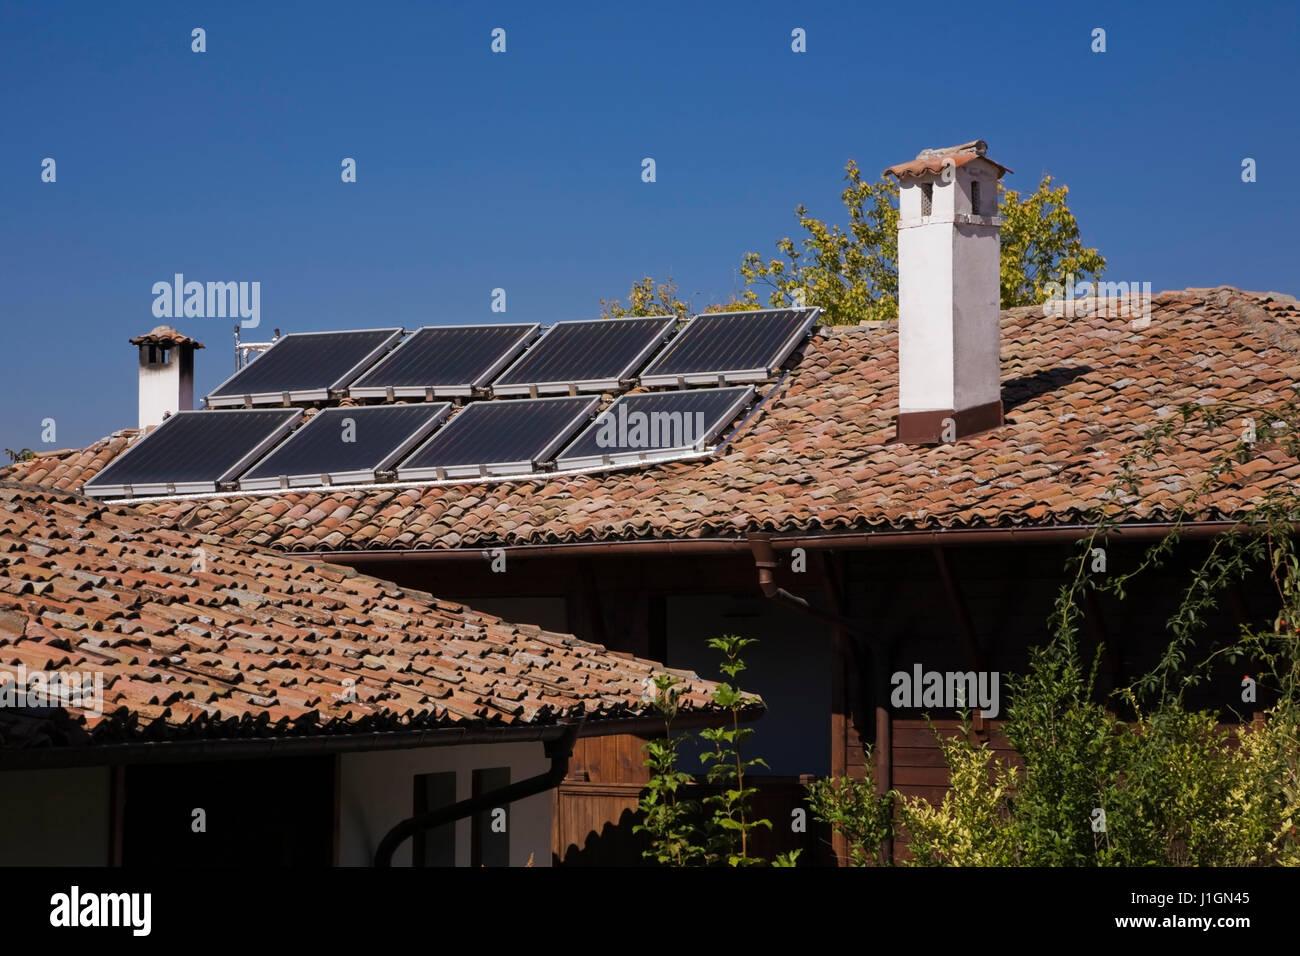 Solar panels on the roof of a residential home, Veliko Tarnovo village, Bulgaria, Eastern Europe - Stock Image